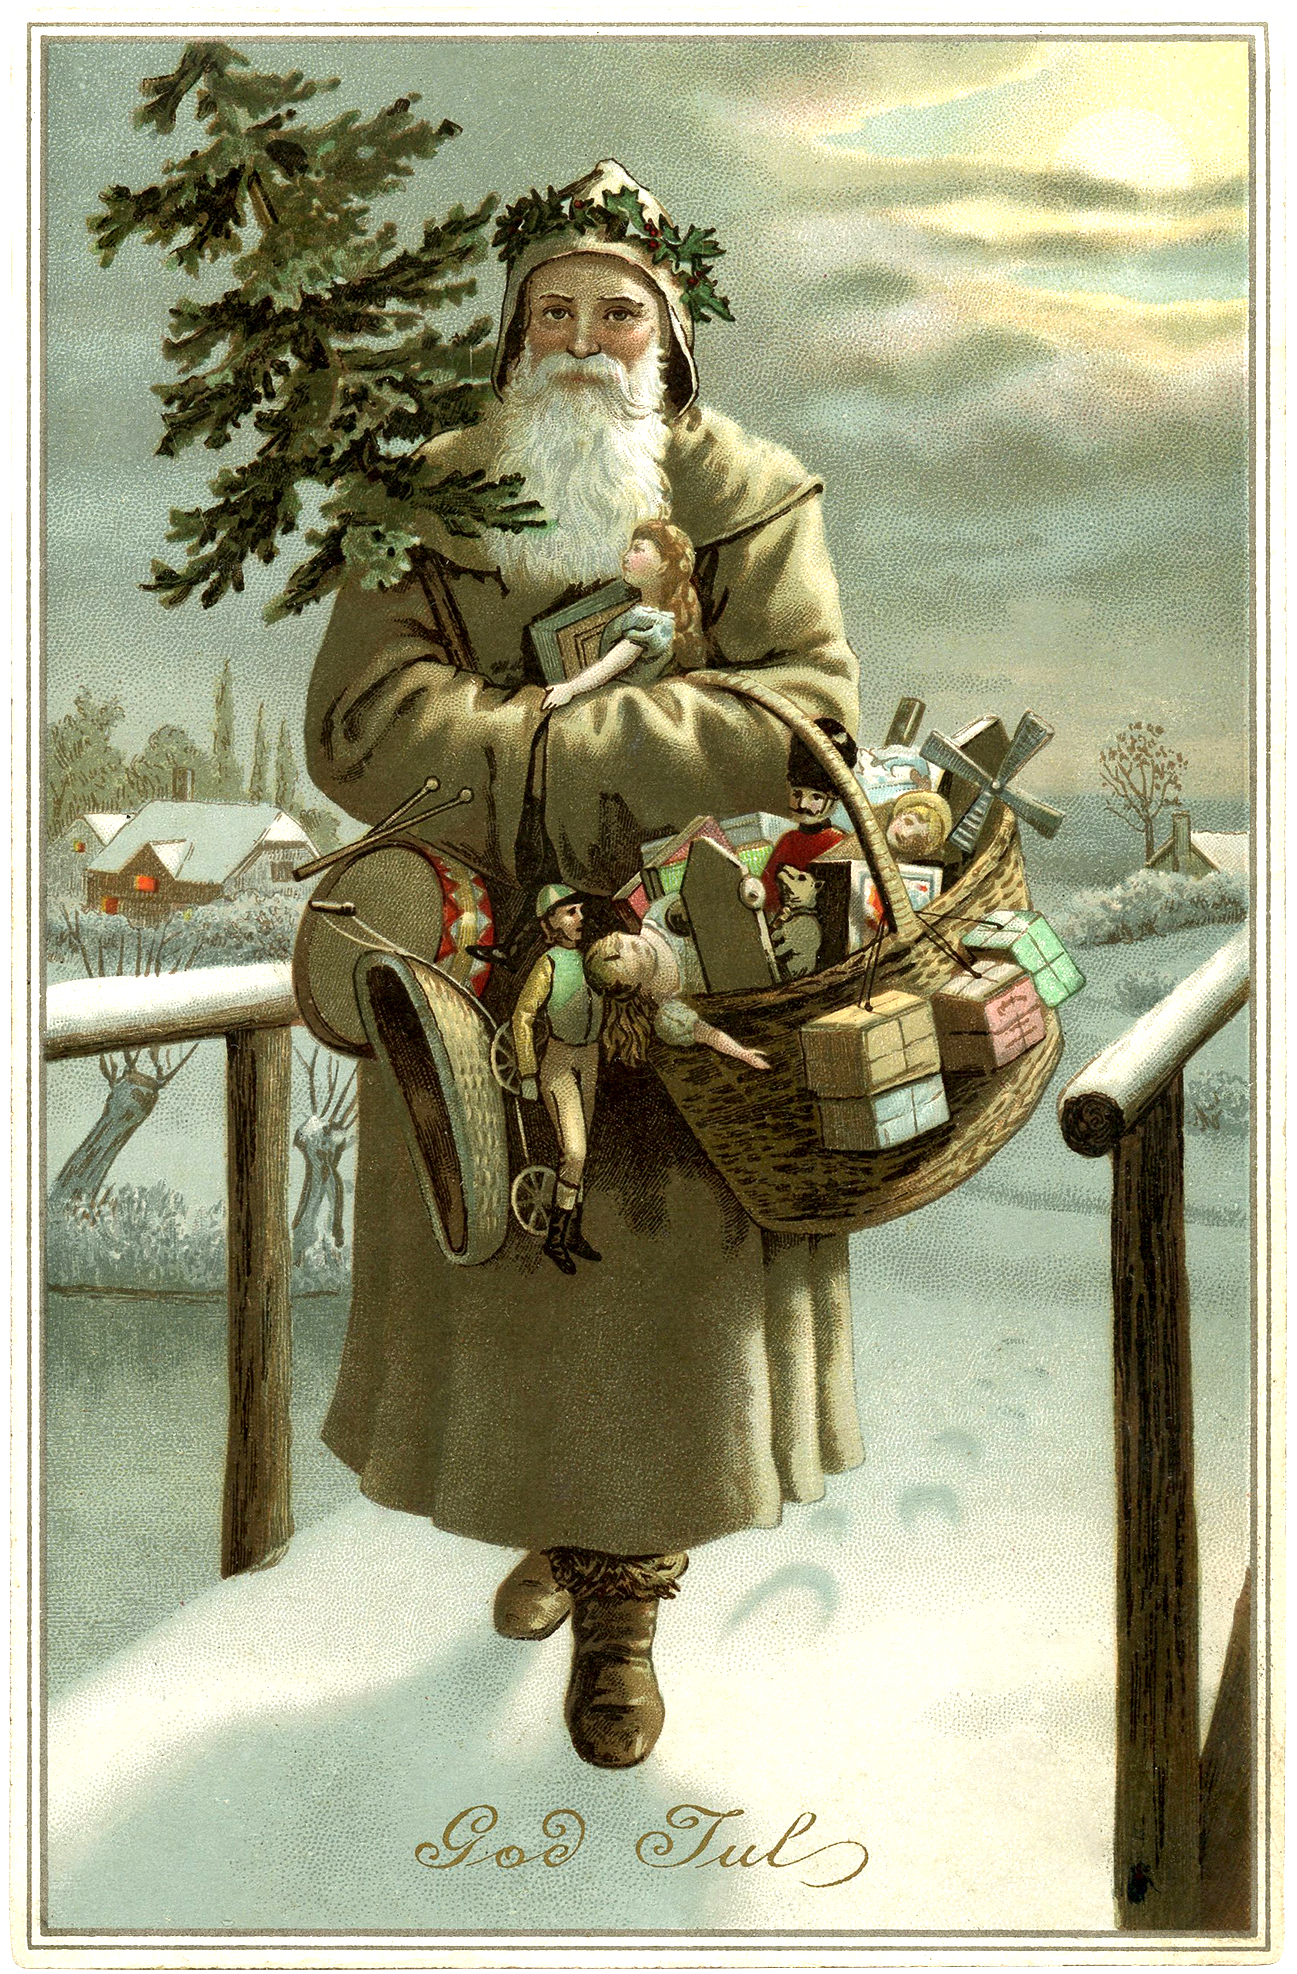 Beautiful Swedish Santa Image - God Jul - The Graphics Fairy